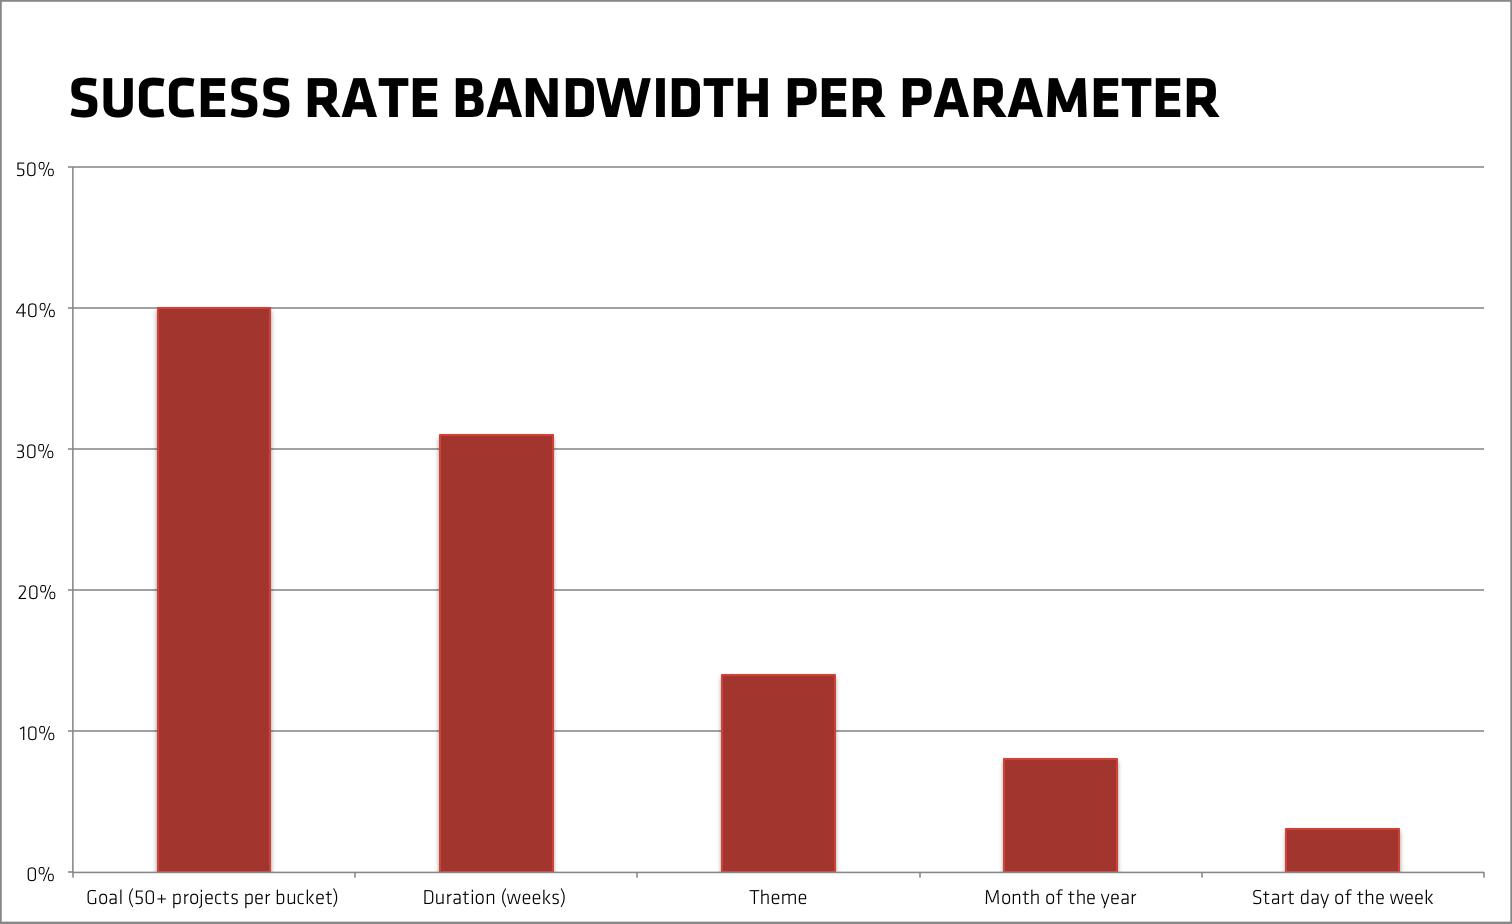 Success rate bandwidth per parameter